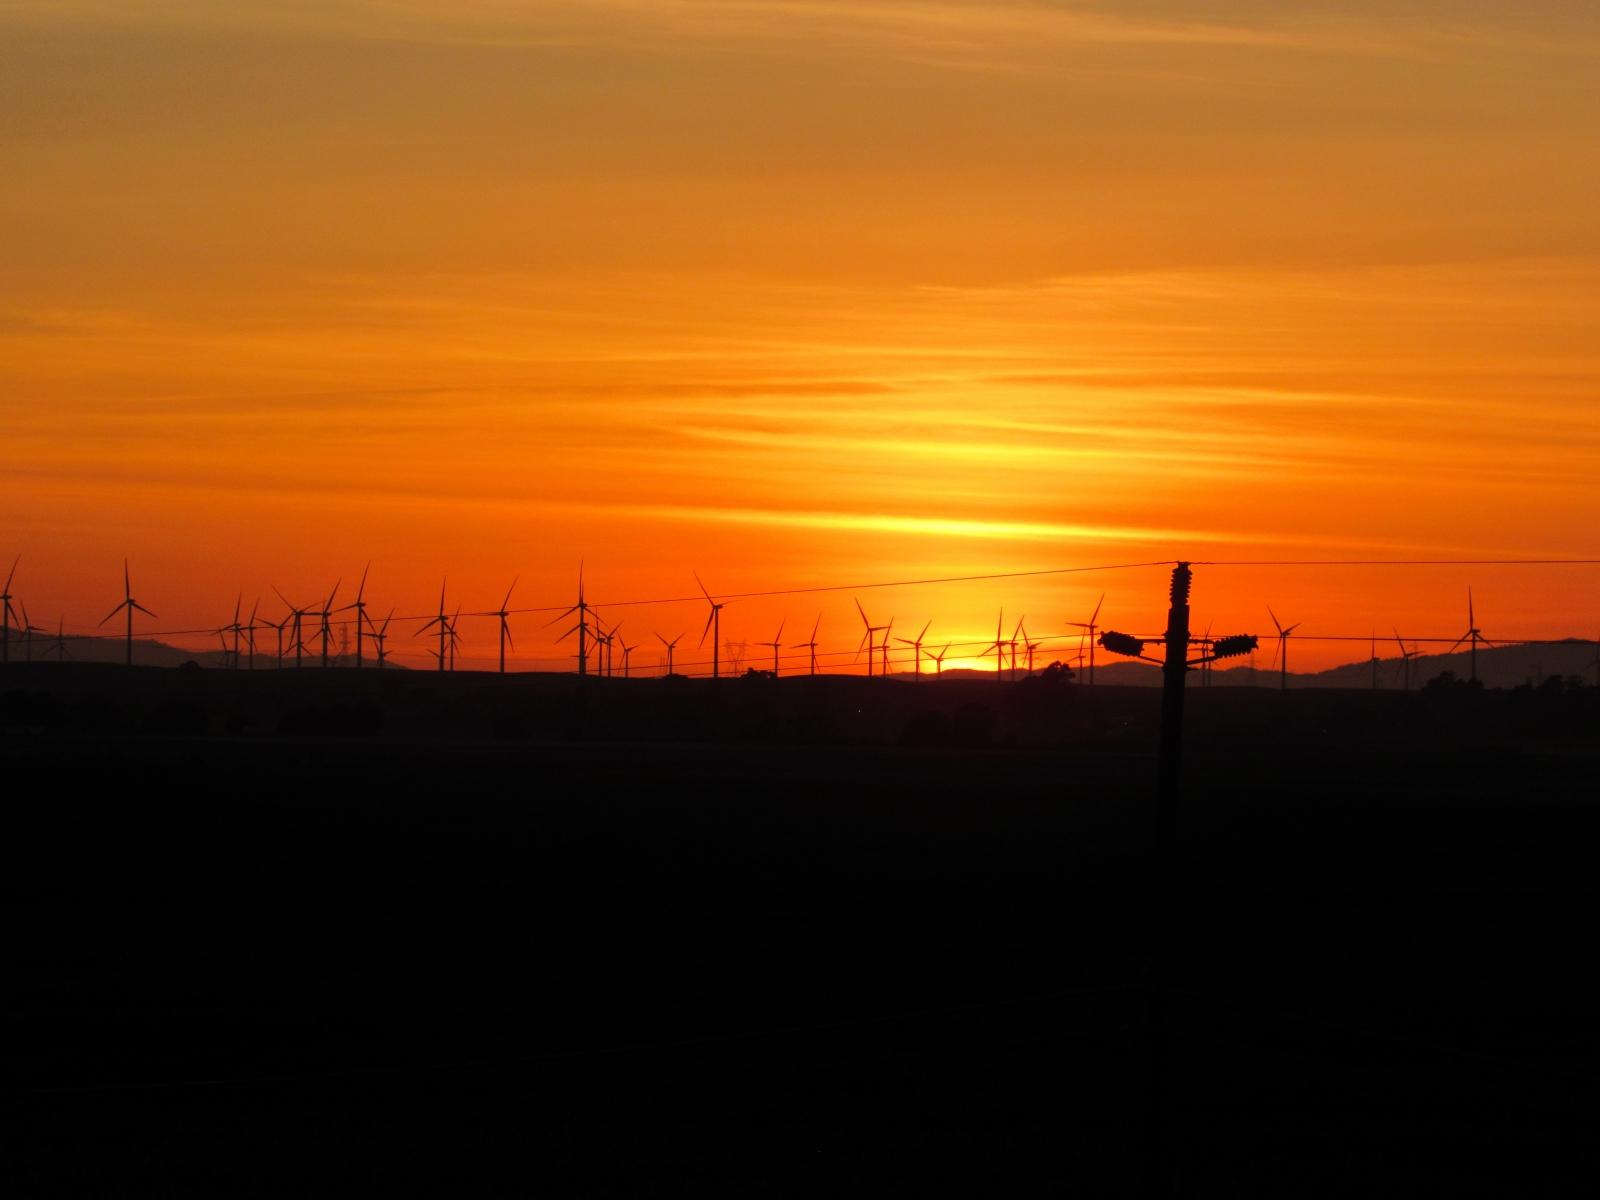 Windmills-in-the-glow